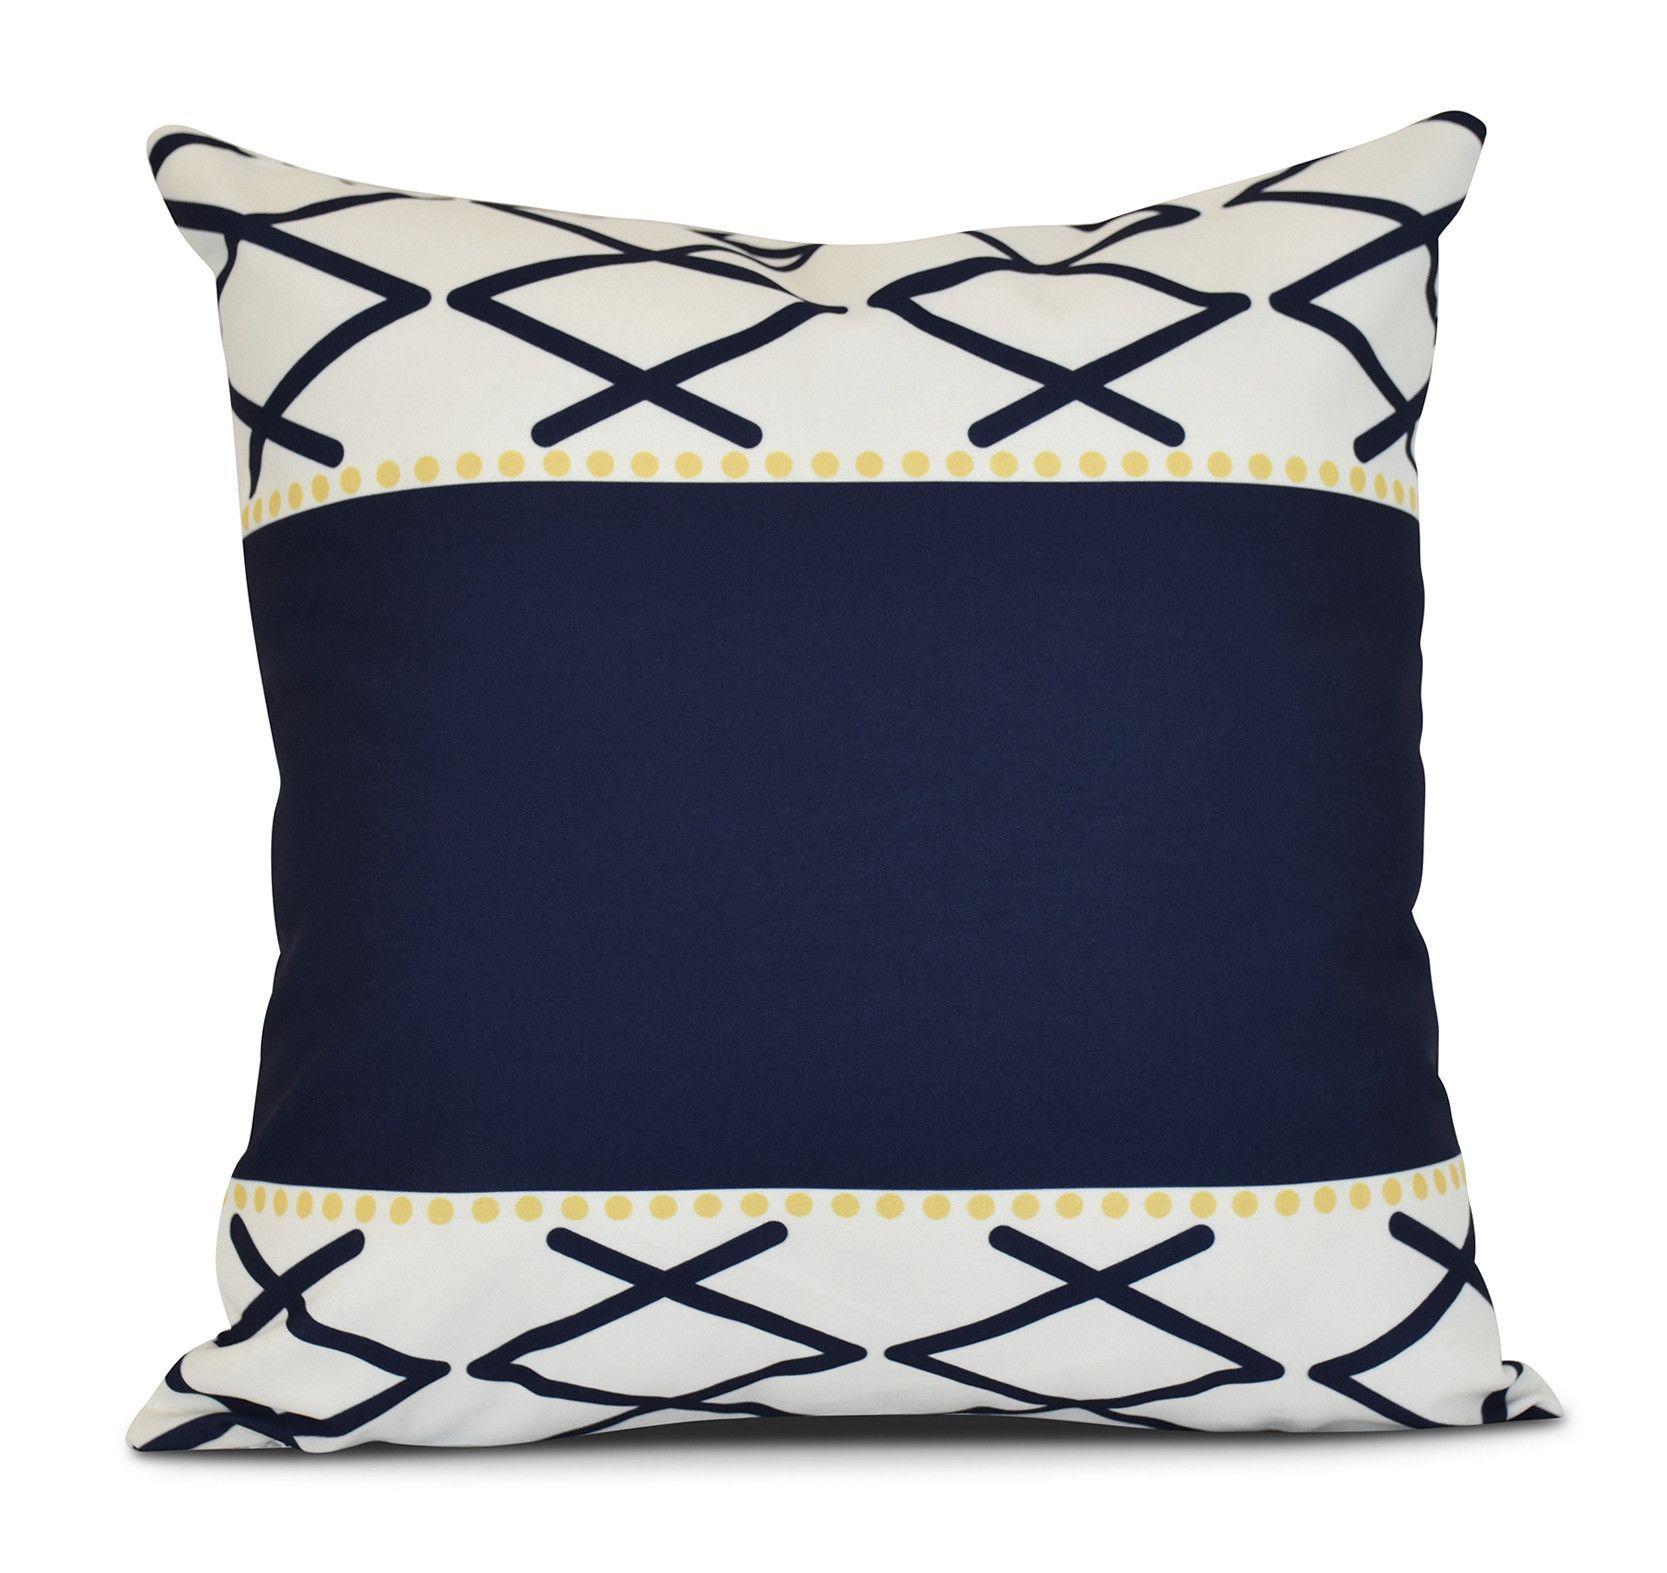 Bartow knot fancy throw pillow knots pillows and throw pillows